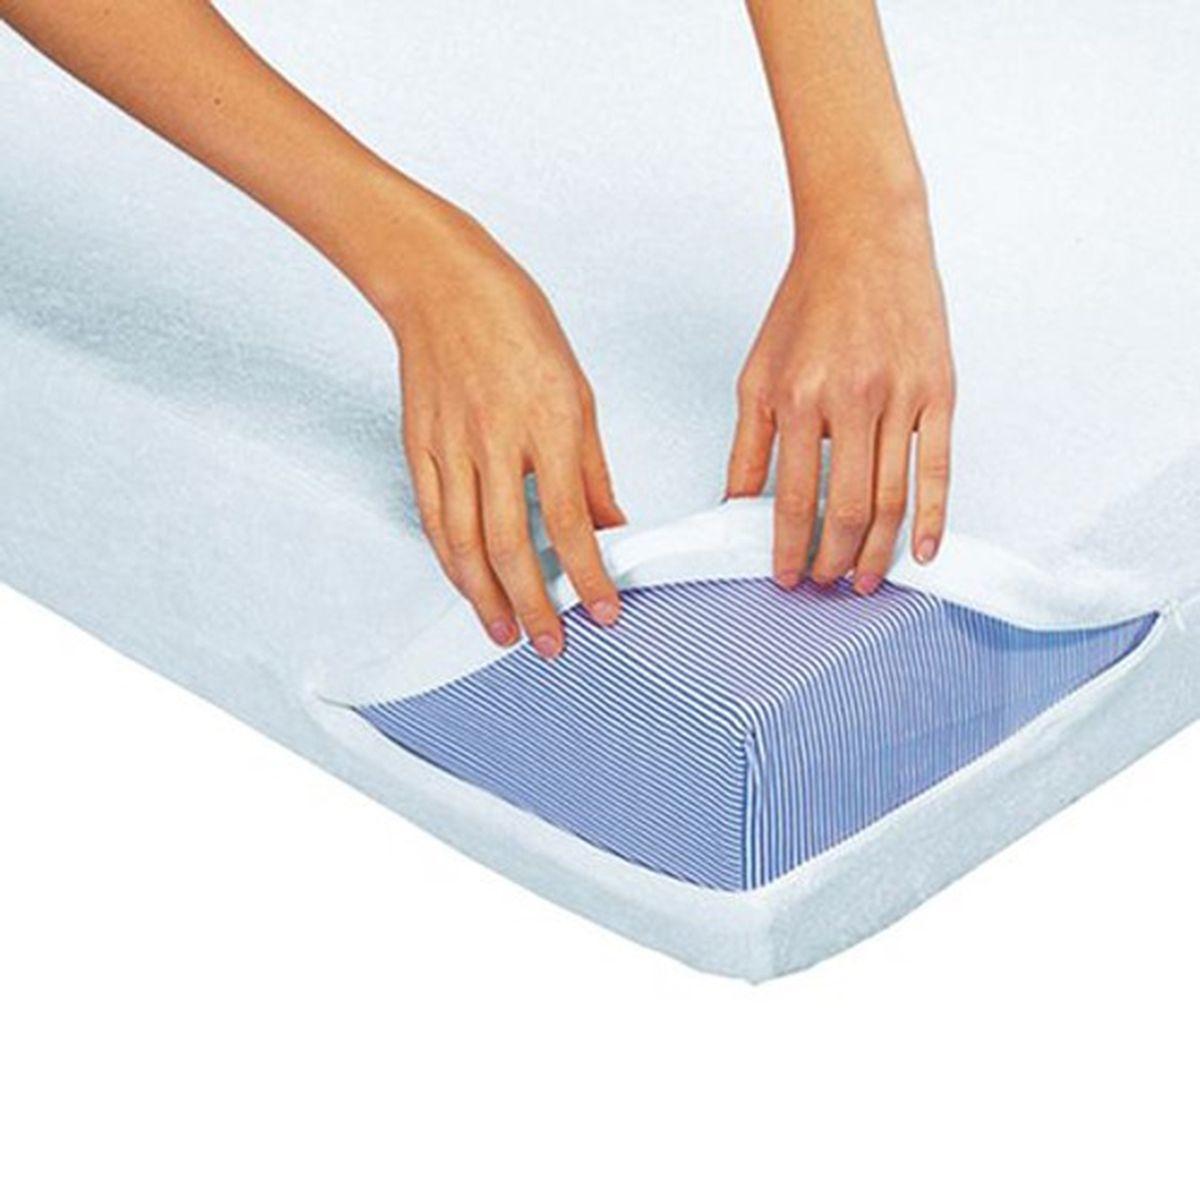 Protège matelas intégral anti punaises de lit